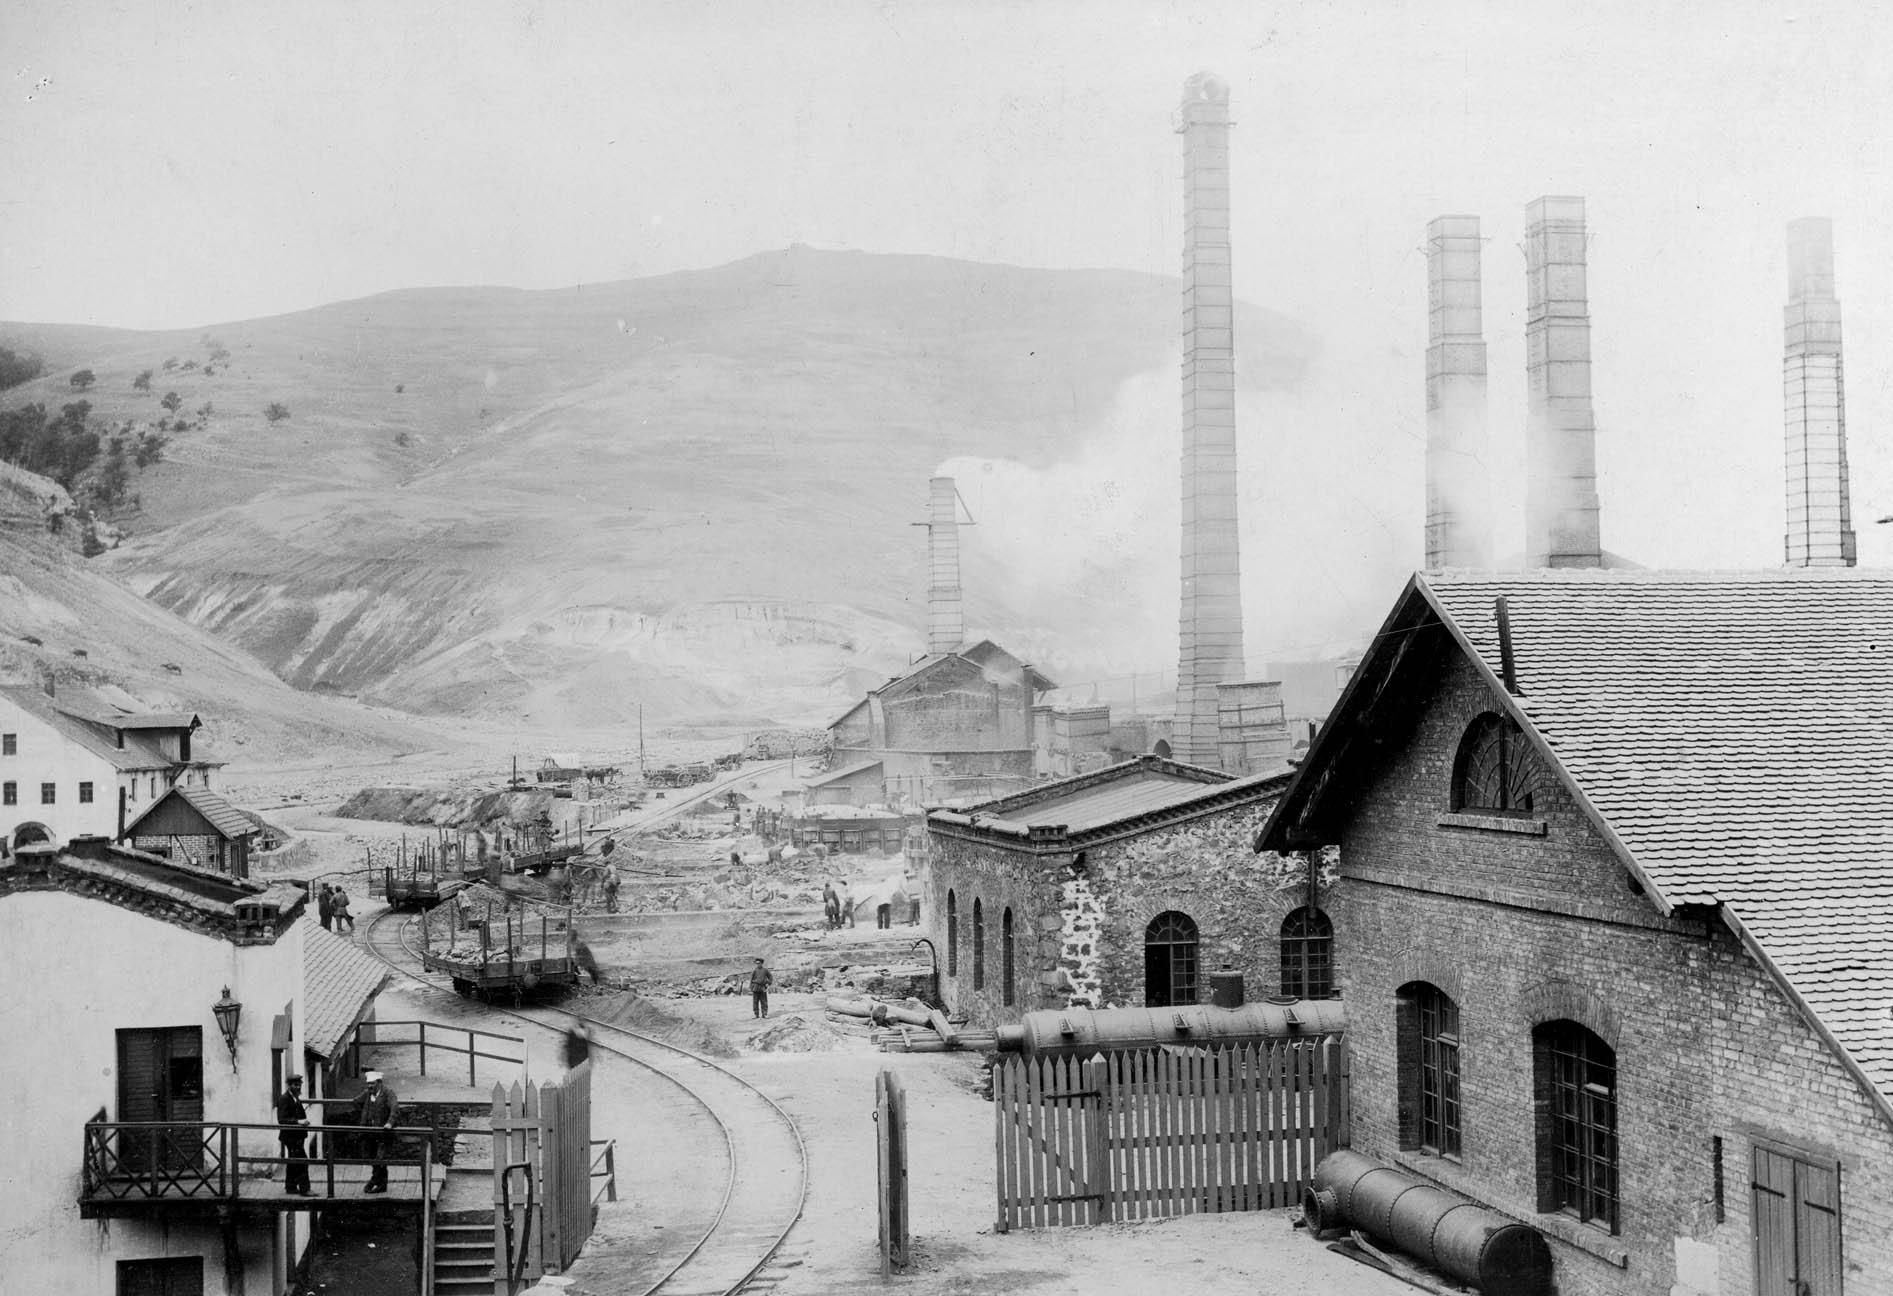 4. smelting works, Kedabeg, 1865